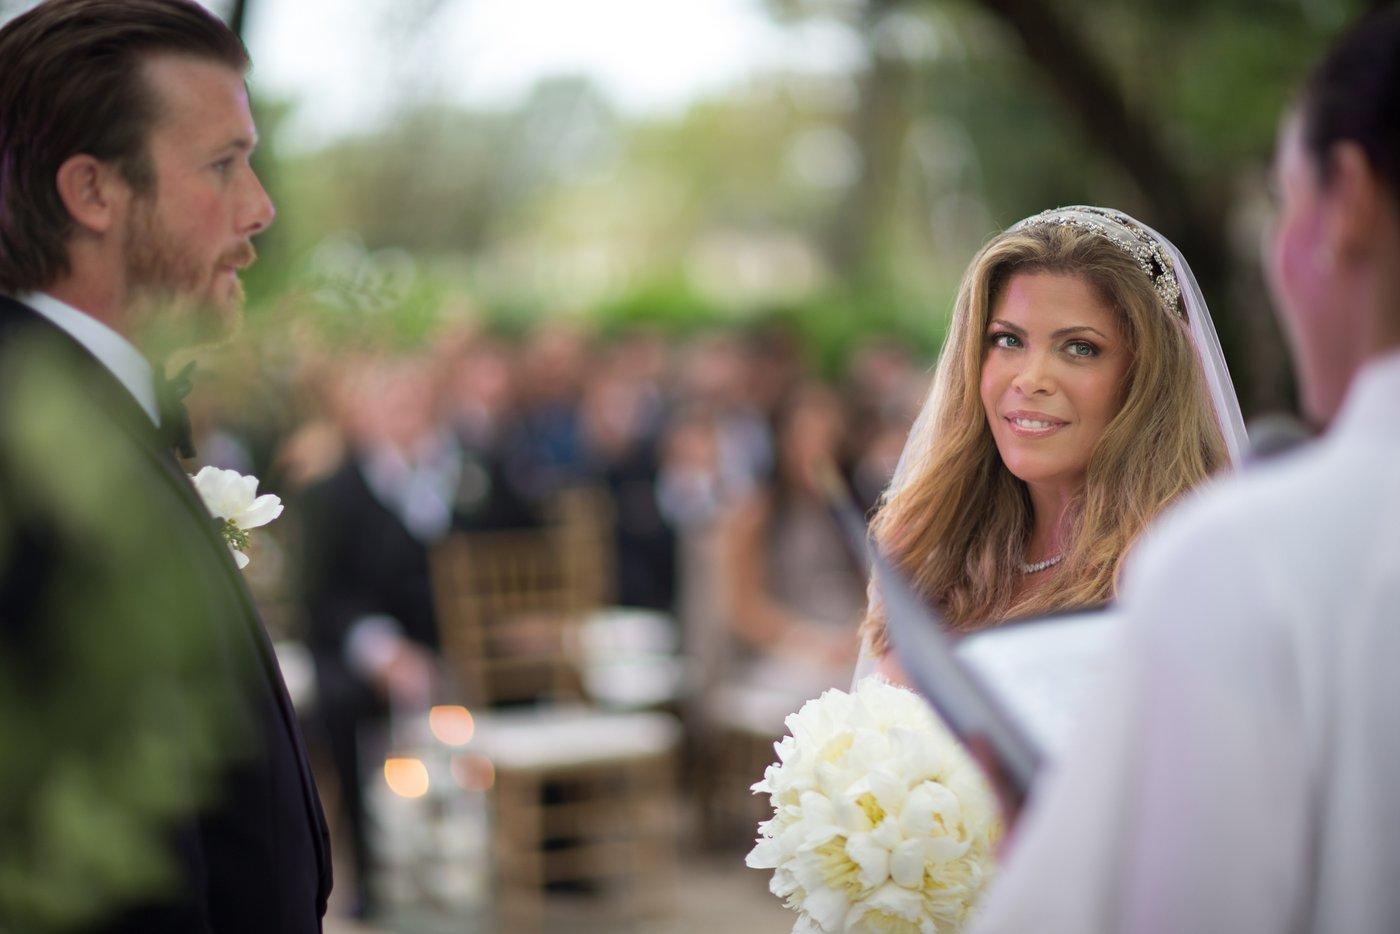 vizcaya ceremony photos miami, best wedding photographers miami, otto haring